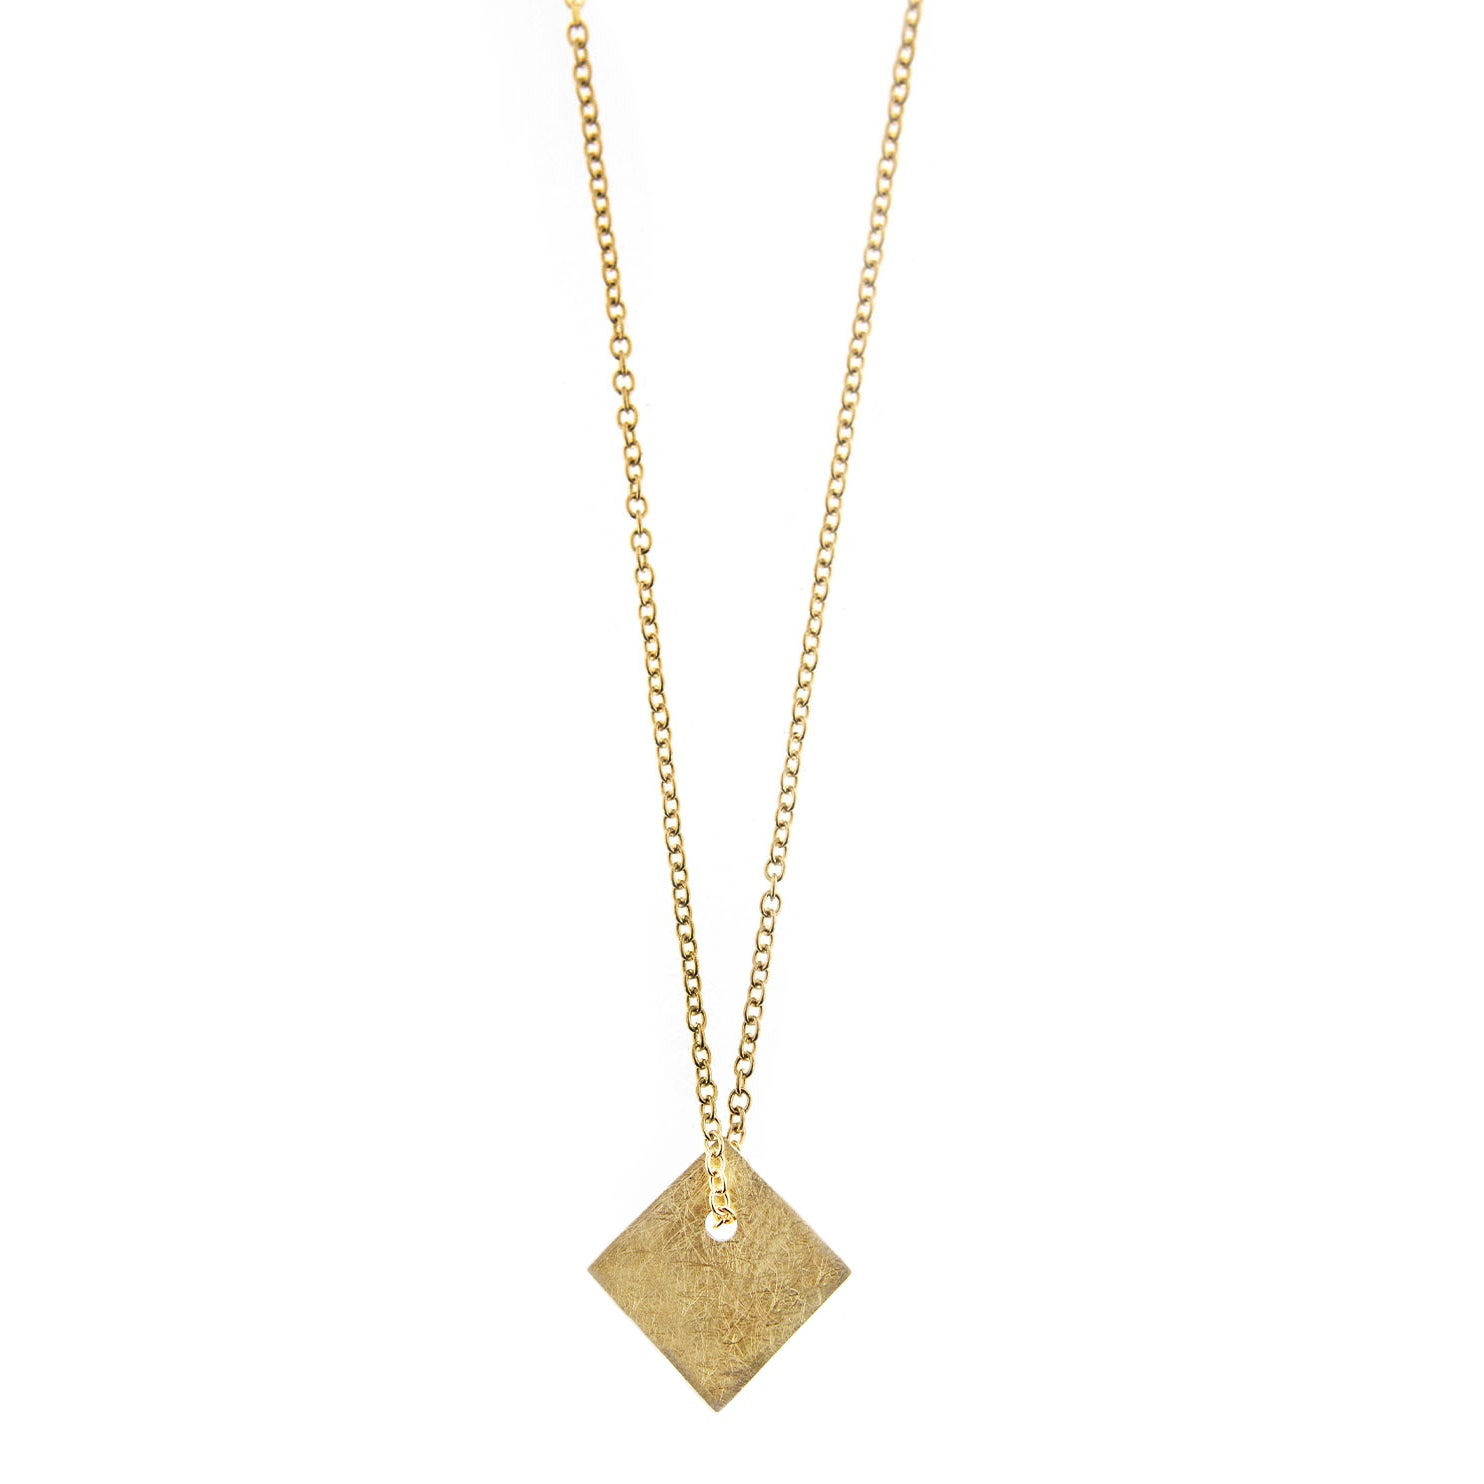 Jona 18 Karat Yellow Gold Pendant Necklace